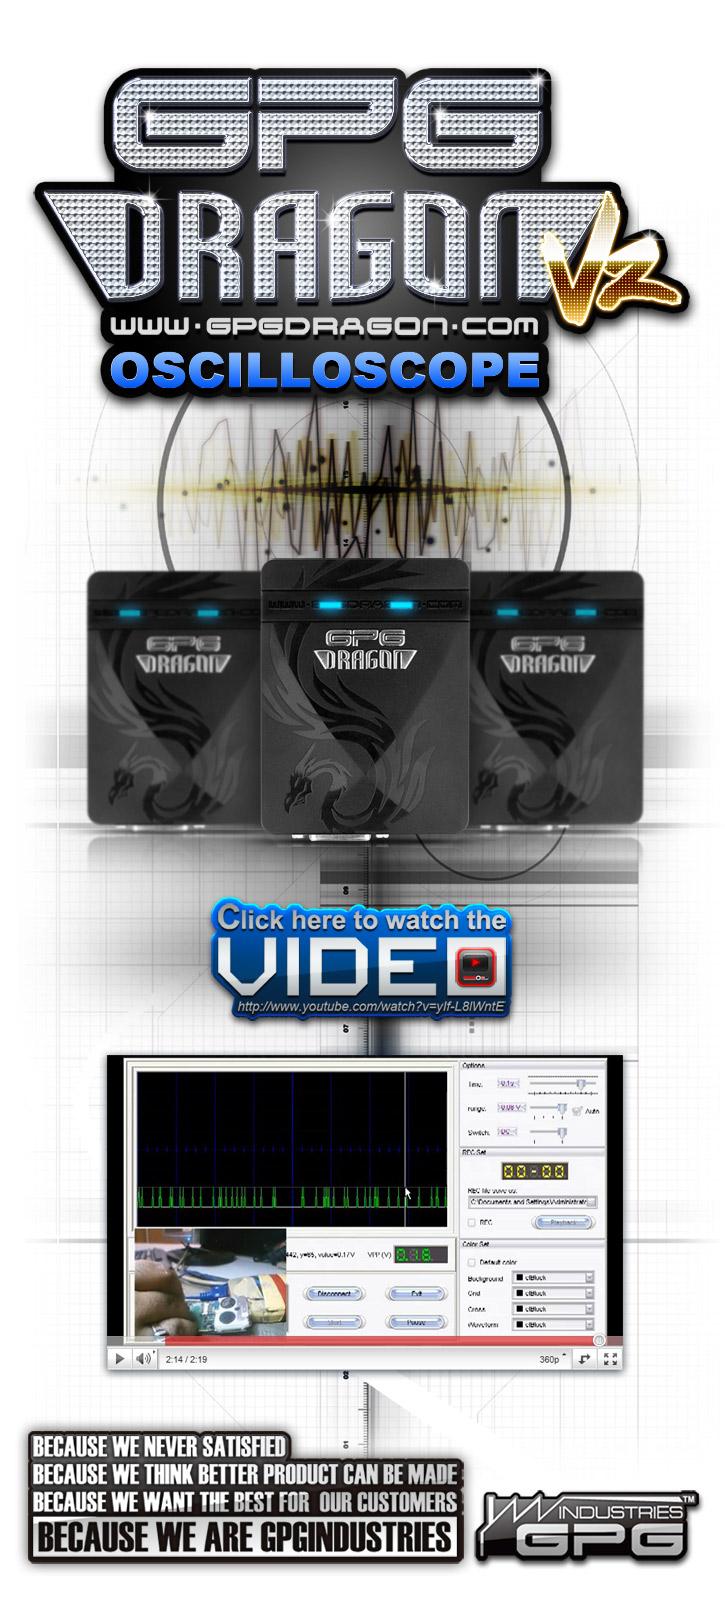 2011 06 20 GPGdragon Oscilloscope 725